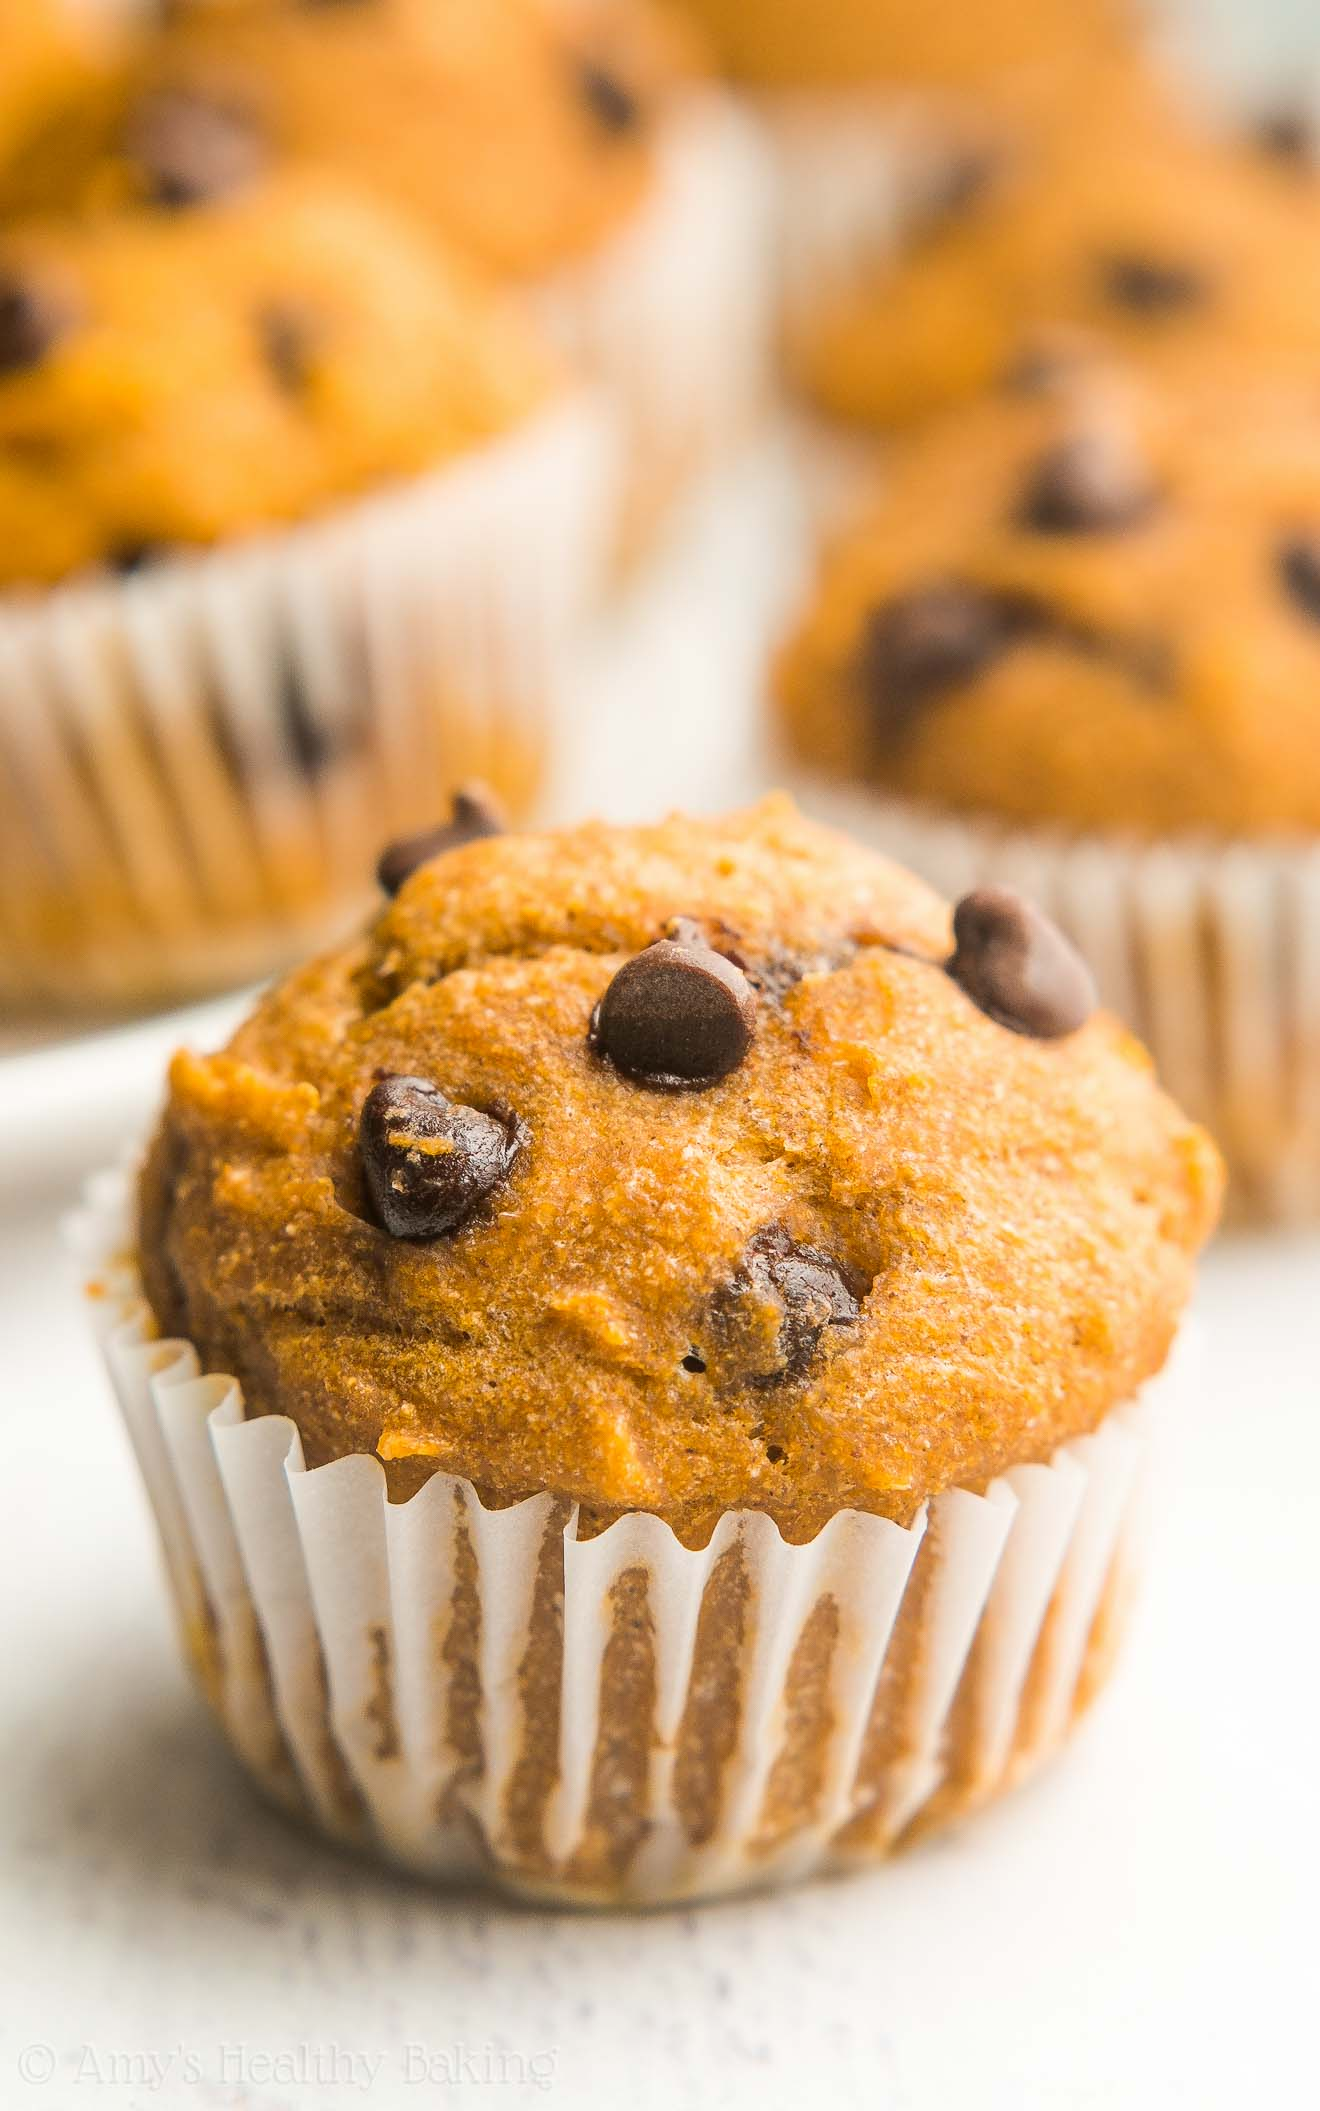 Chocolate Chip Pumpkin Mini Muffins | Amy's Healthy Baking